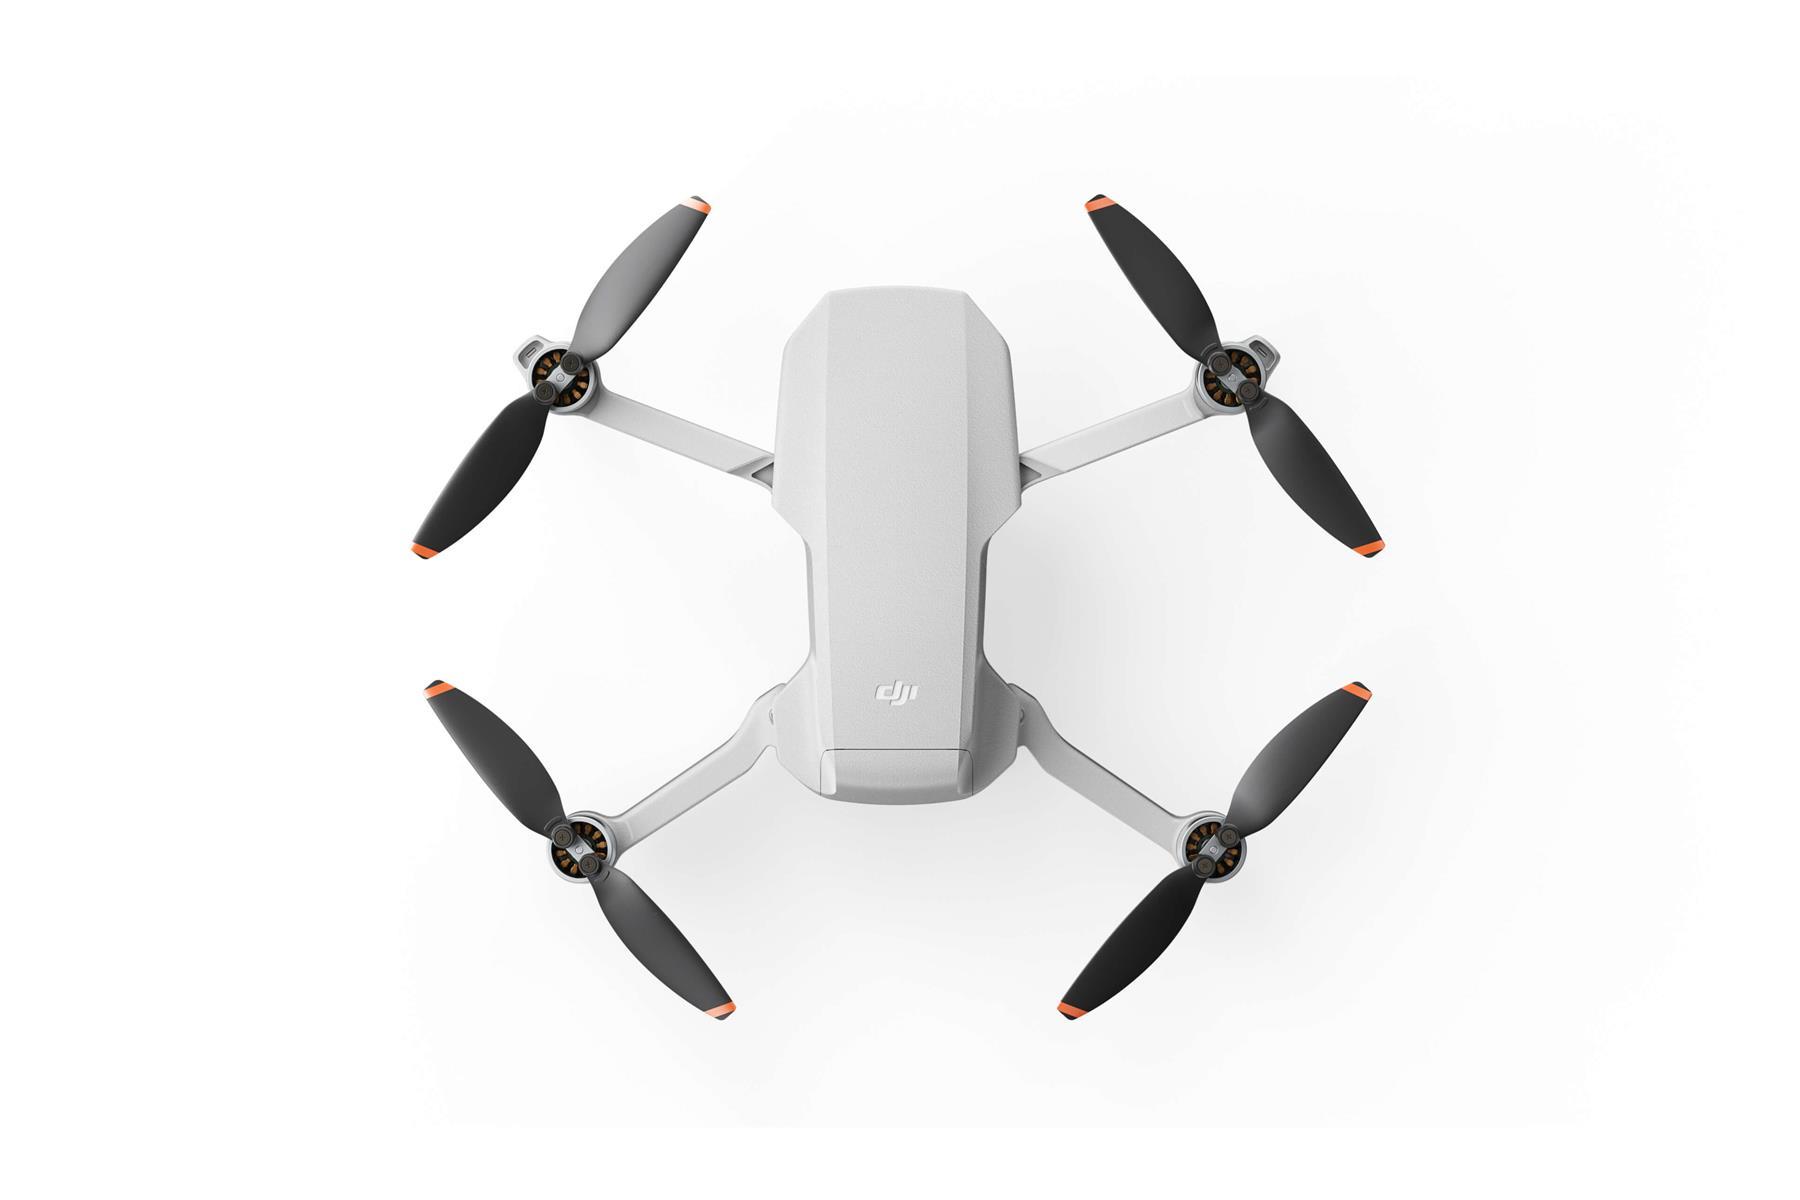 thumbnail 4 - DJI Mini 2 Standard/Combo - Ultralight and Foldable Drone Quadcopter - REFURB